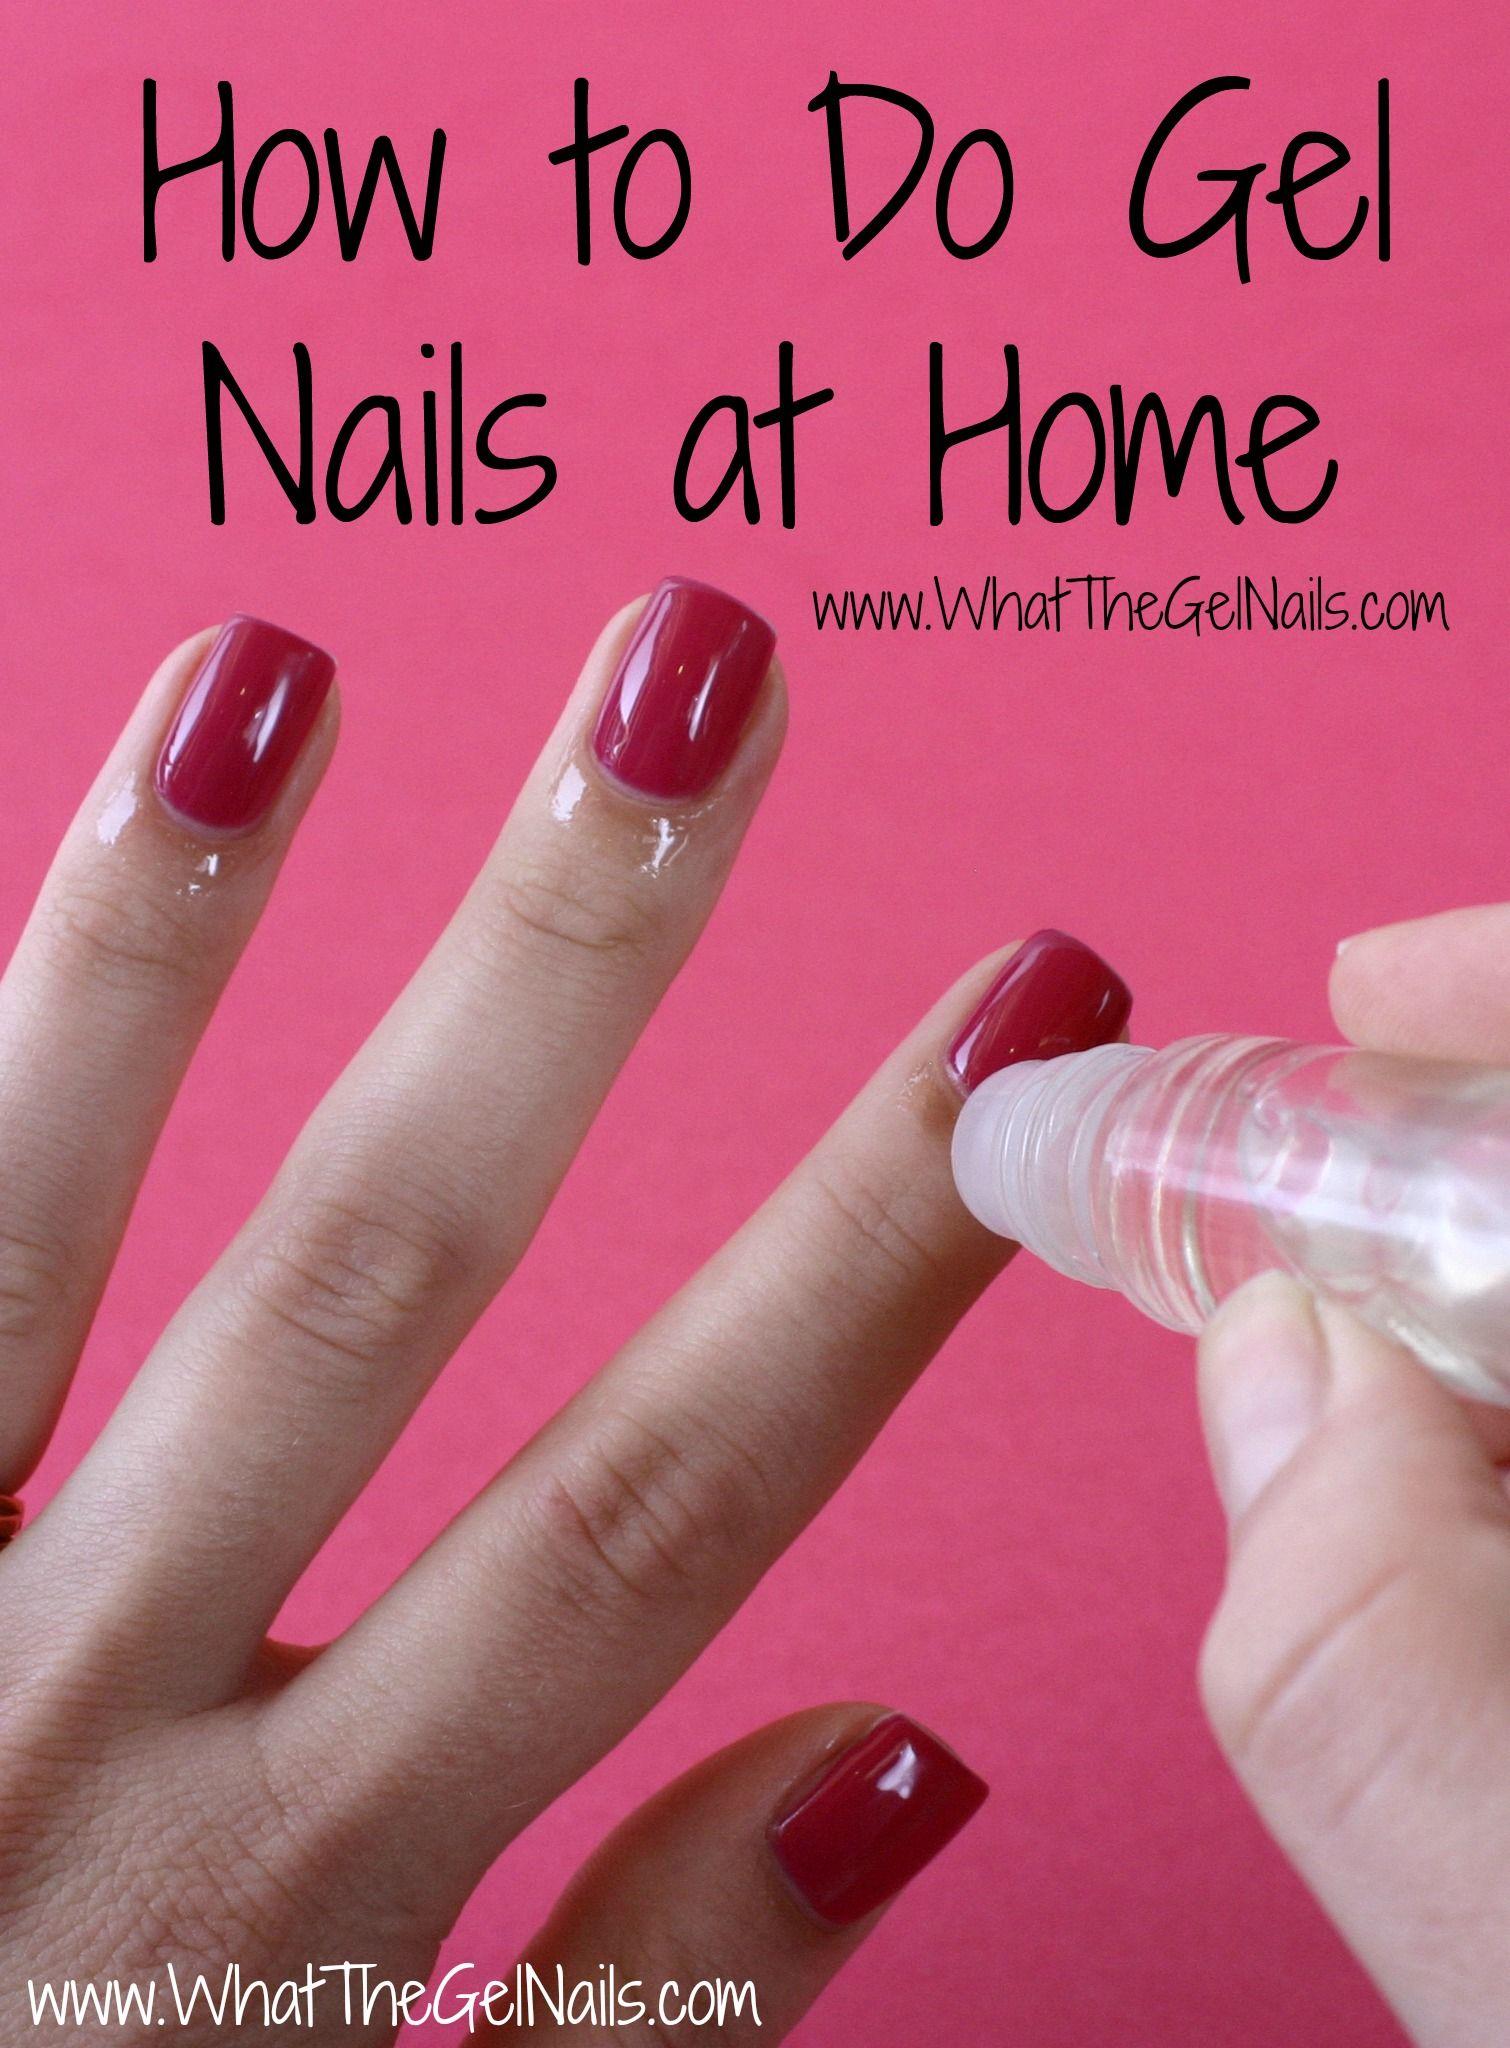 How To Do Gel Nails At Home Gel Nail Removal Gel Nails Diy Hard Gel Nails